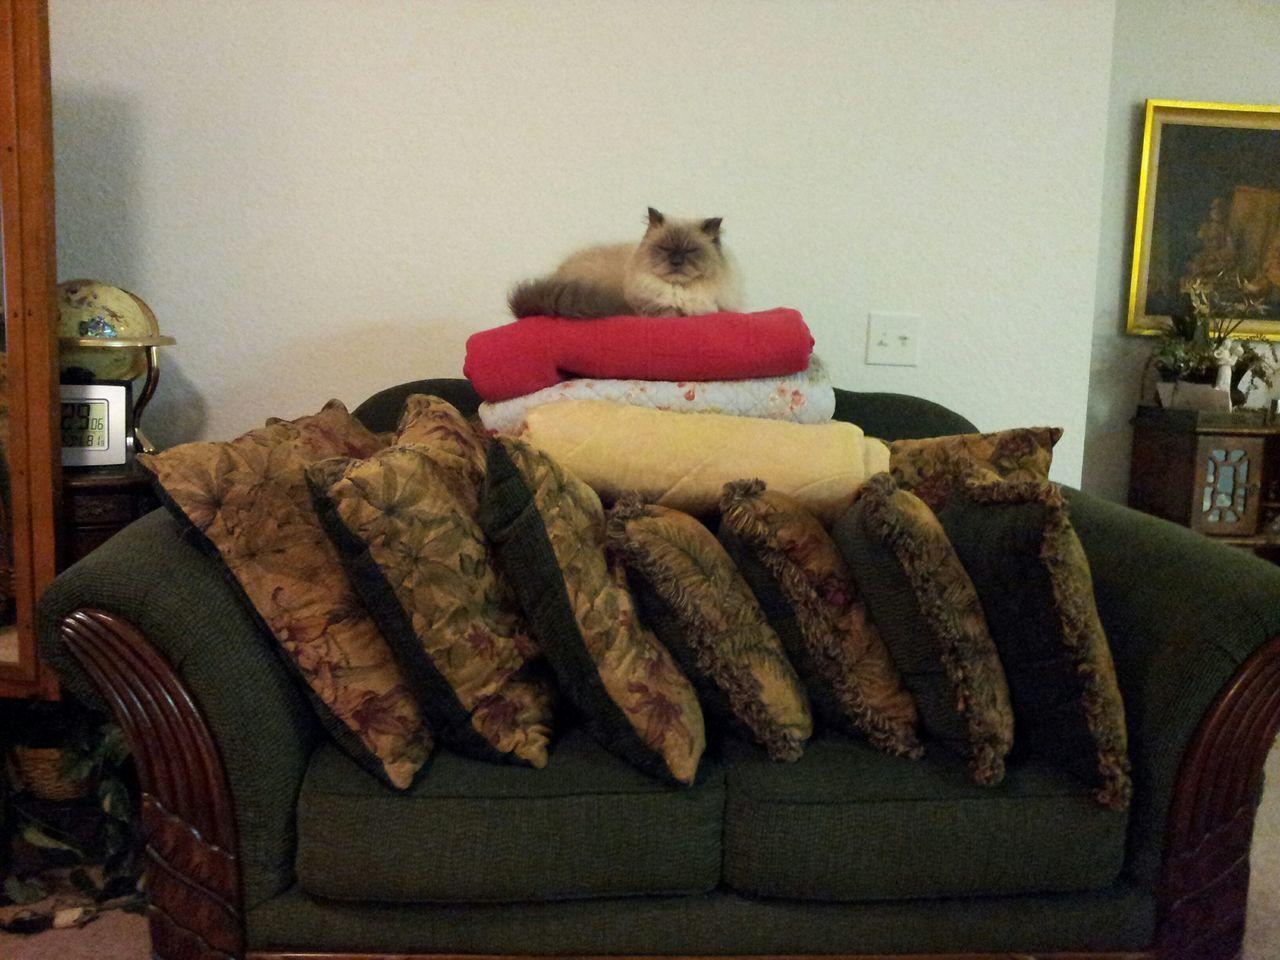 domestic cat, pets, domestic animals, animal themes, one animal, mammal, indoors, cat, feline, sofa, no people, home interior, sitting, stuffed, day